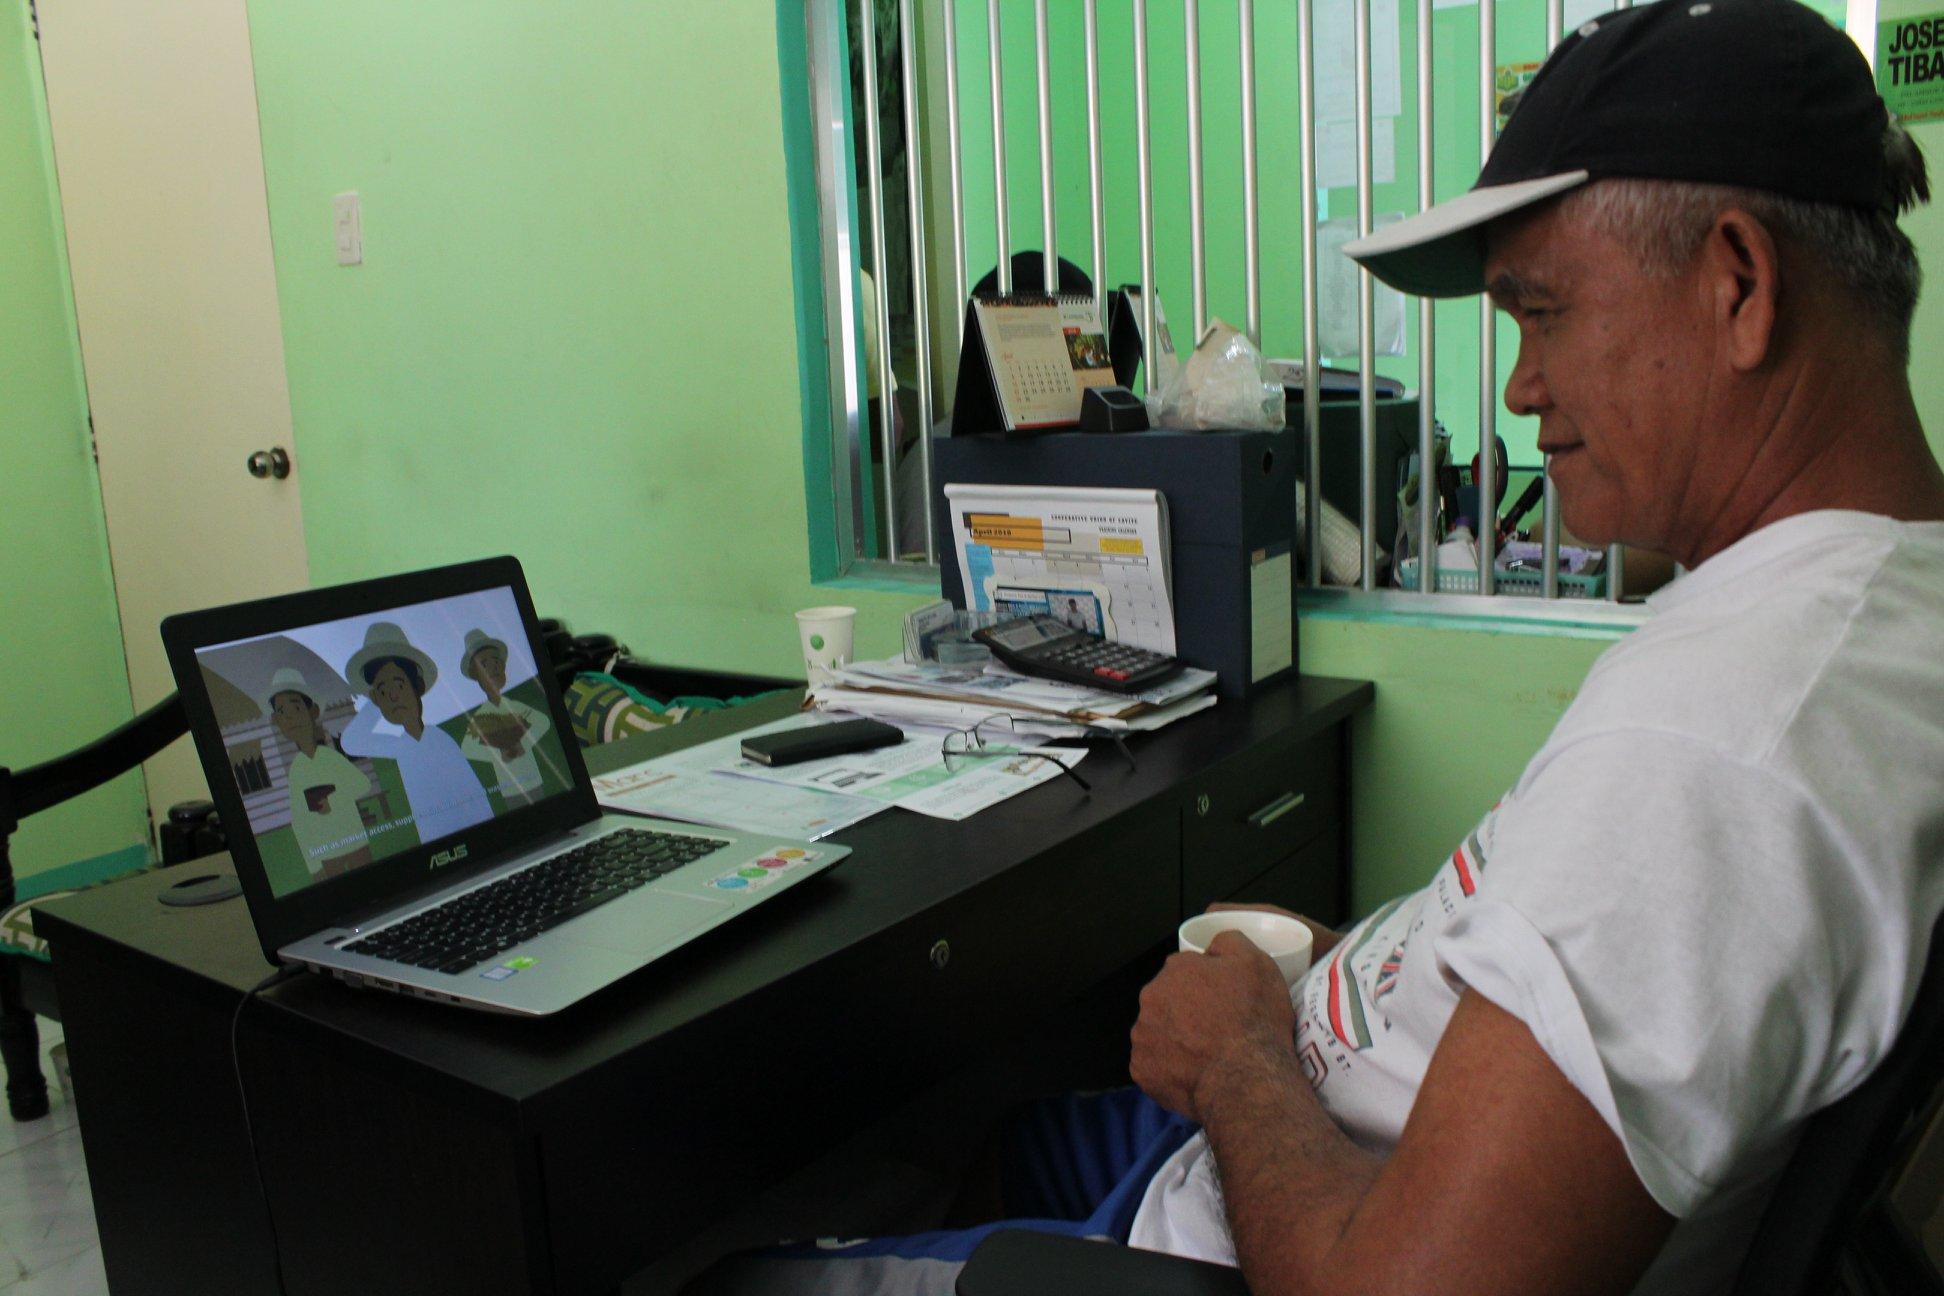 UPLIFTING LIVES. E-Magsasaka's goal is to uplift the lives of the Filipino smallholder farmers through technology. Photo courtesy of E-Magsasaka